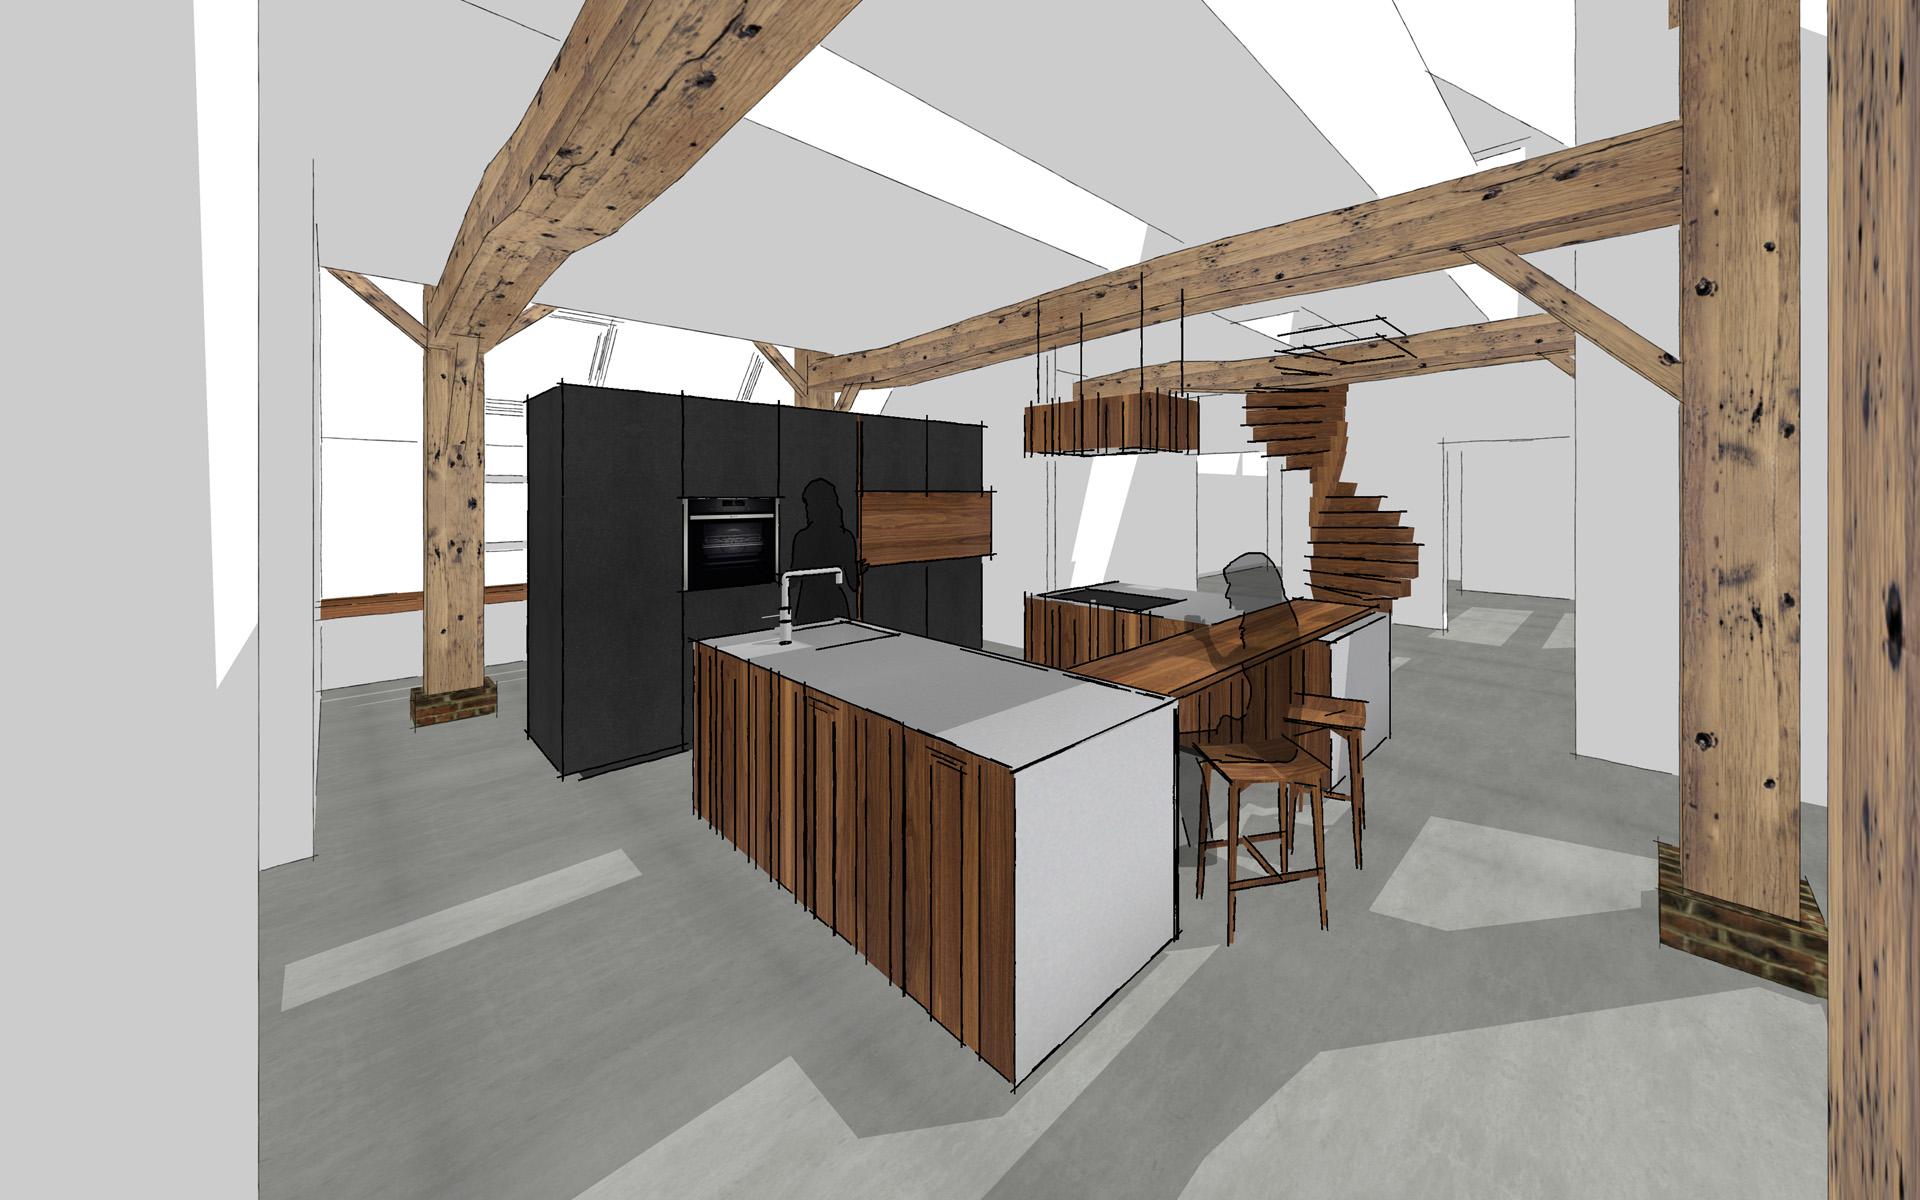 Slaapkamer meubels leiderdorp for - Meubels studio ...